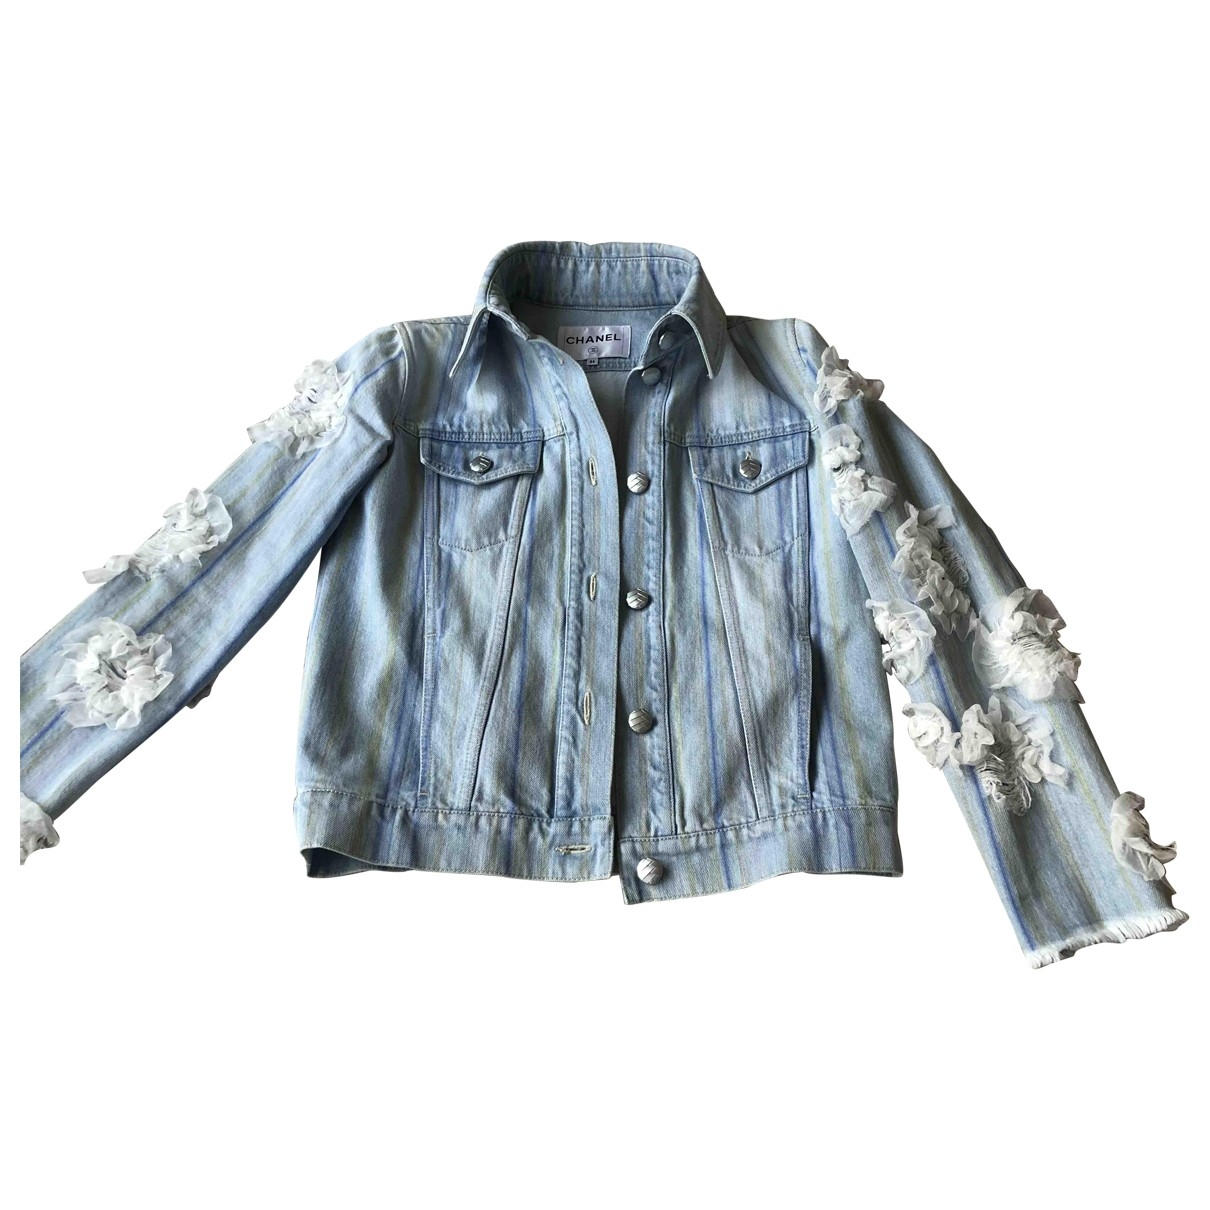 Chanel \N Blue Denim - Jeans jacket for Women 34 FR